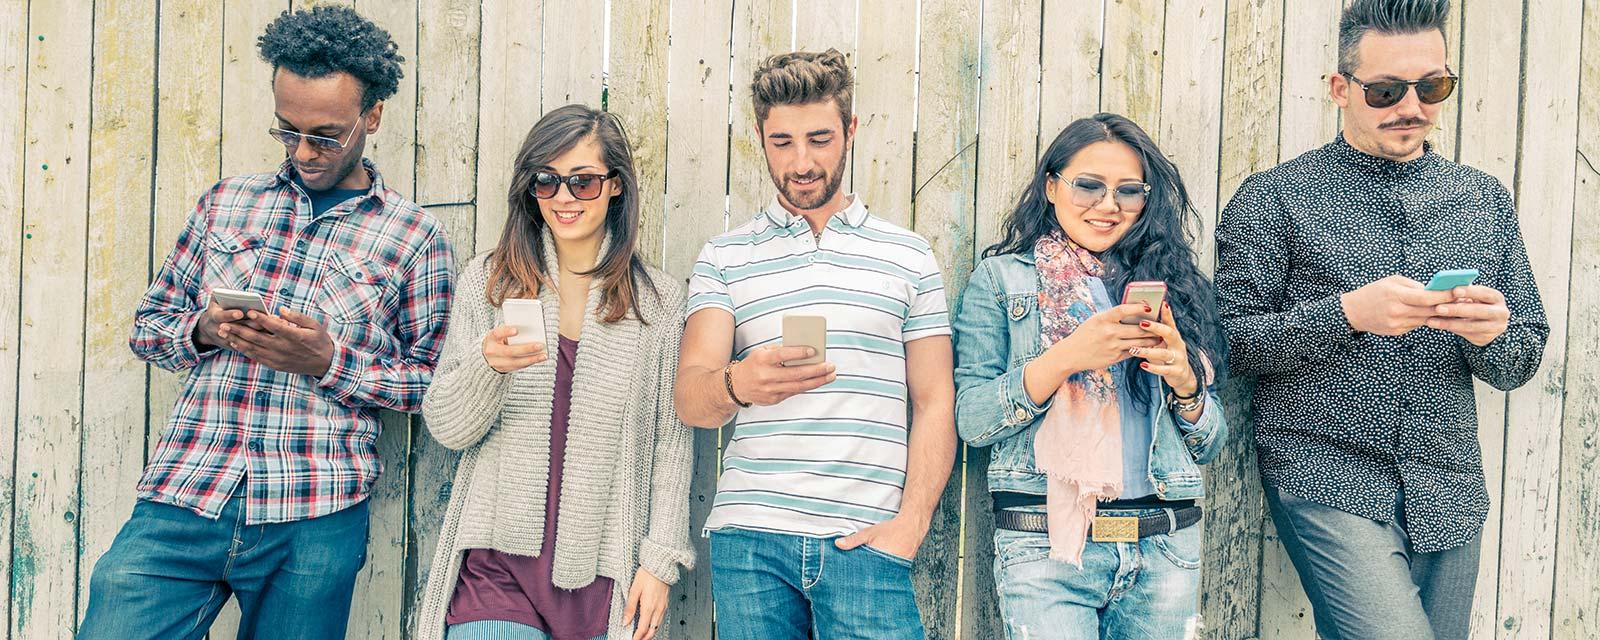 Menschen verwenden Smartphones - SEO-Audit